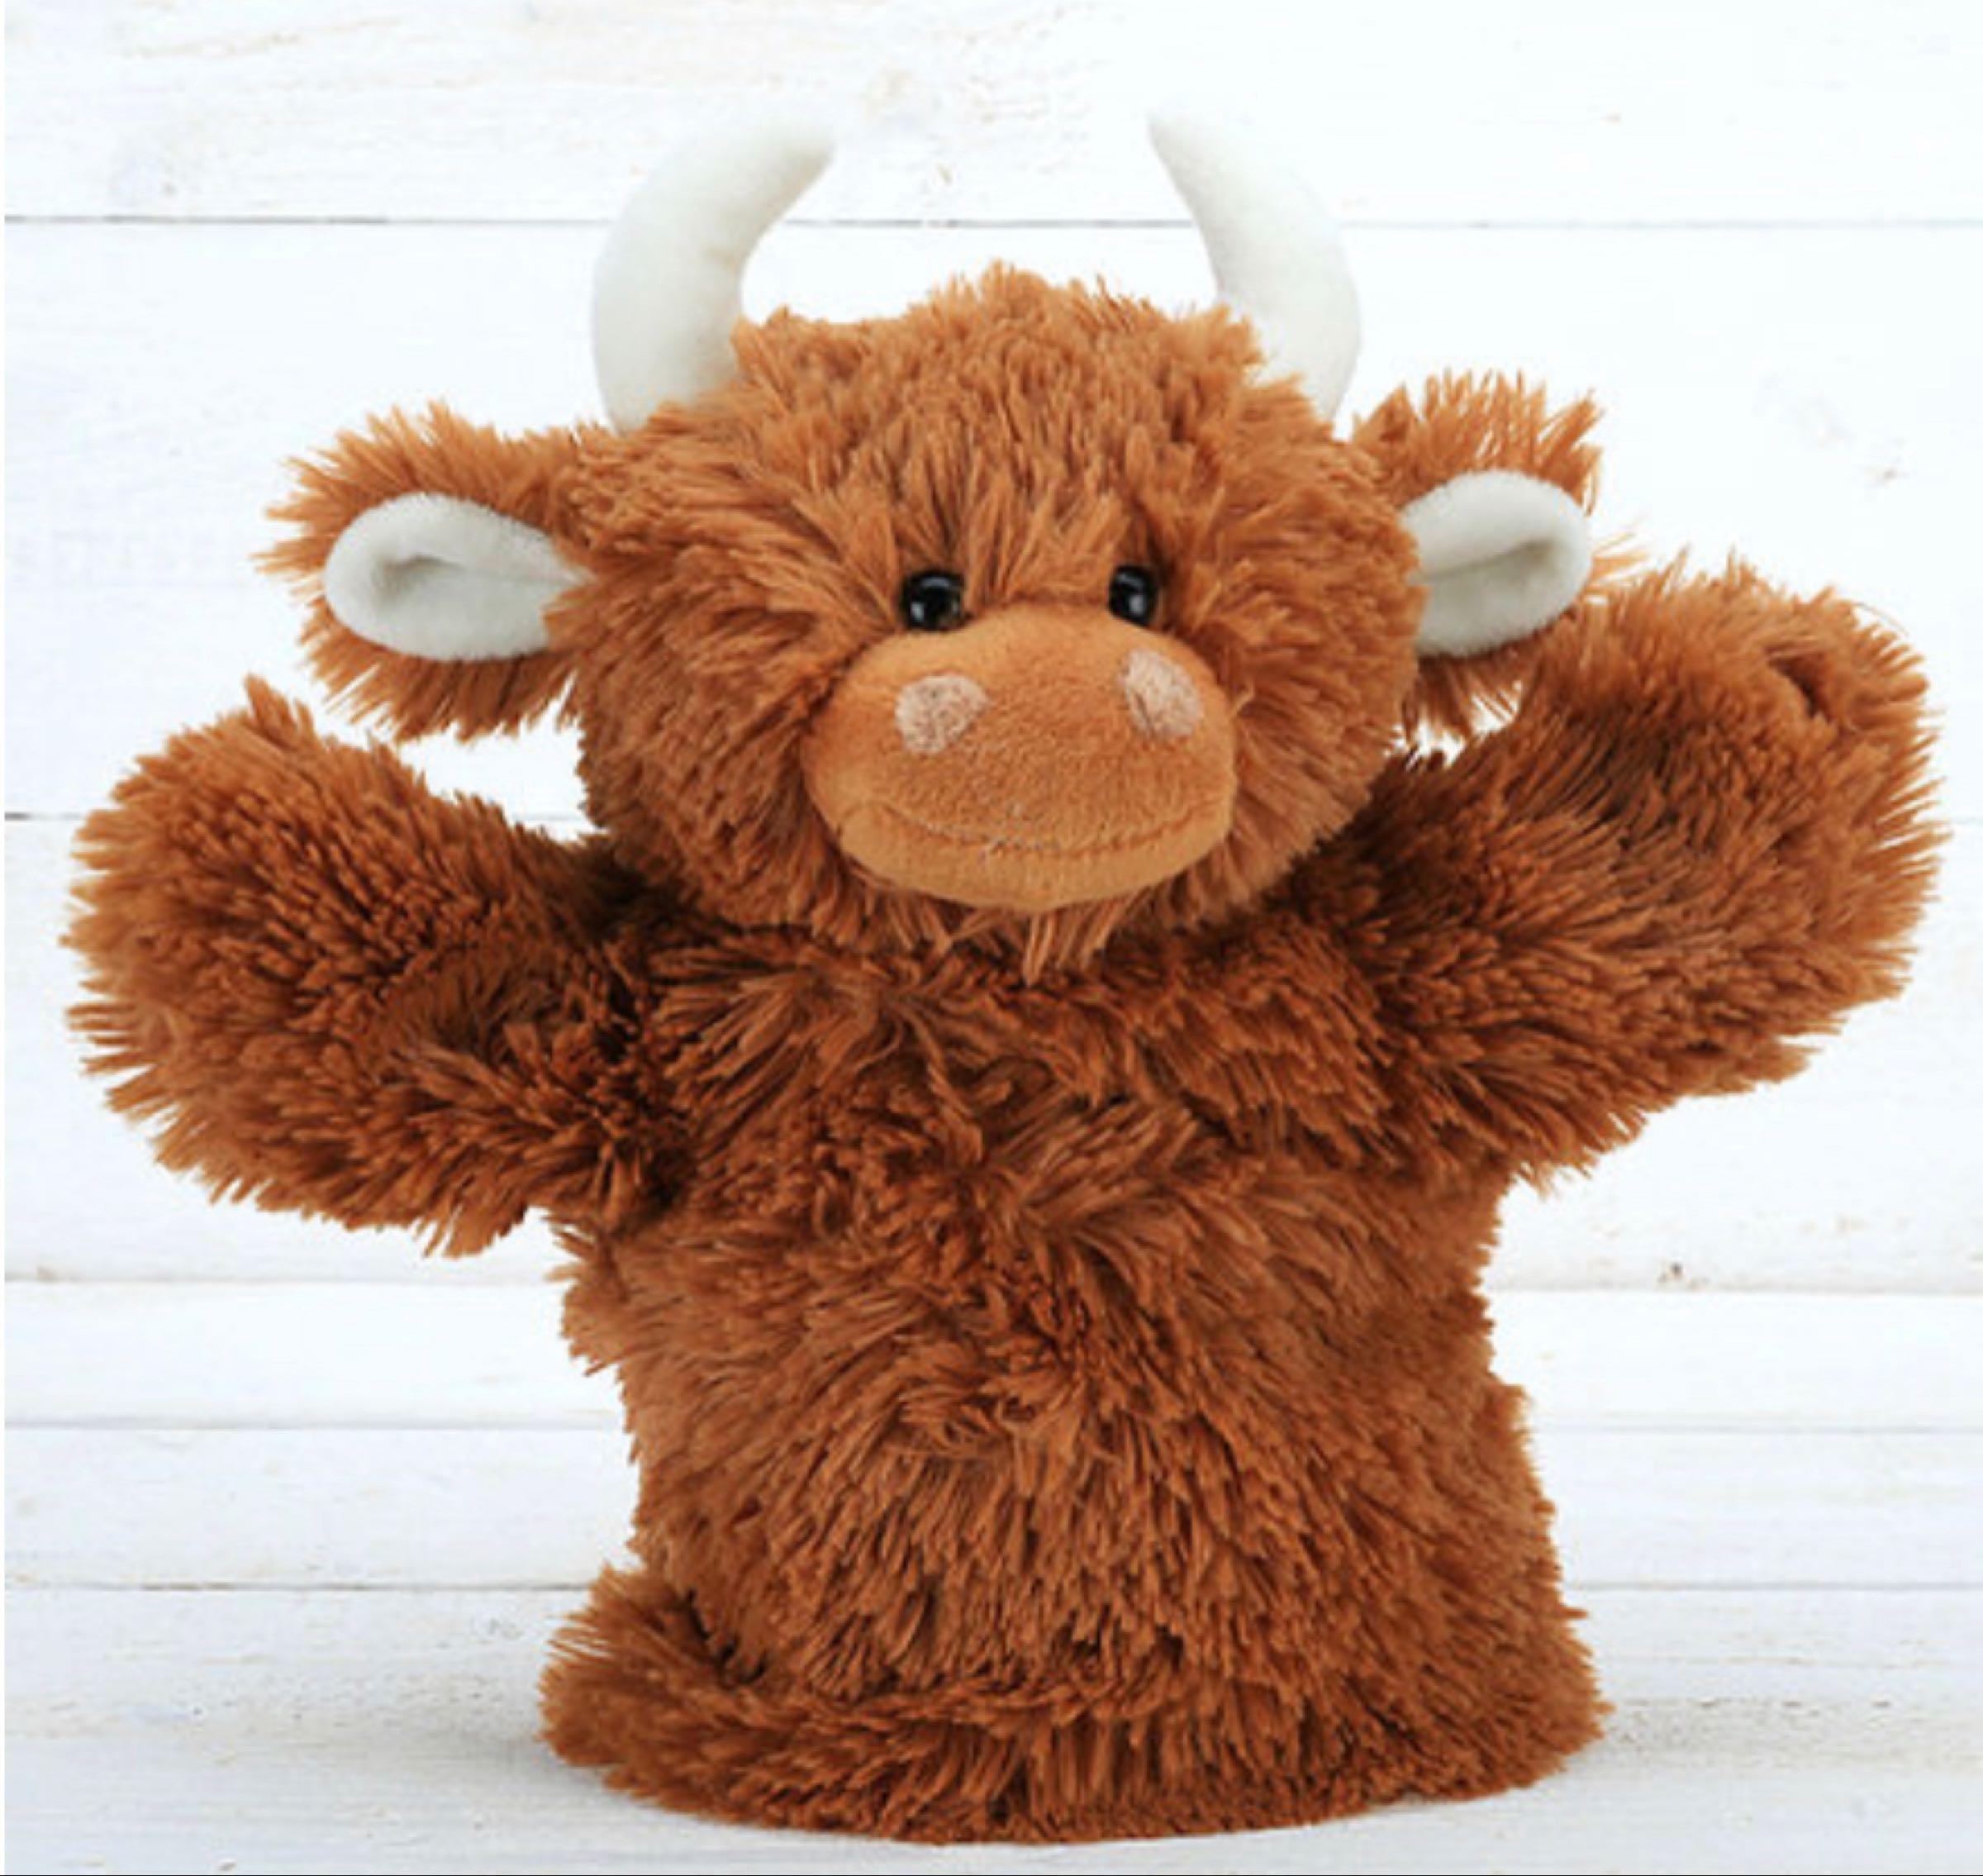 Jomanda highland cow hand puppet 23cm